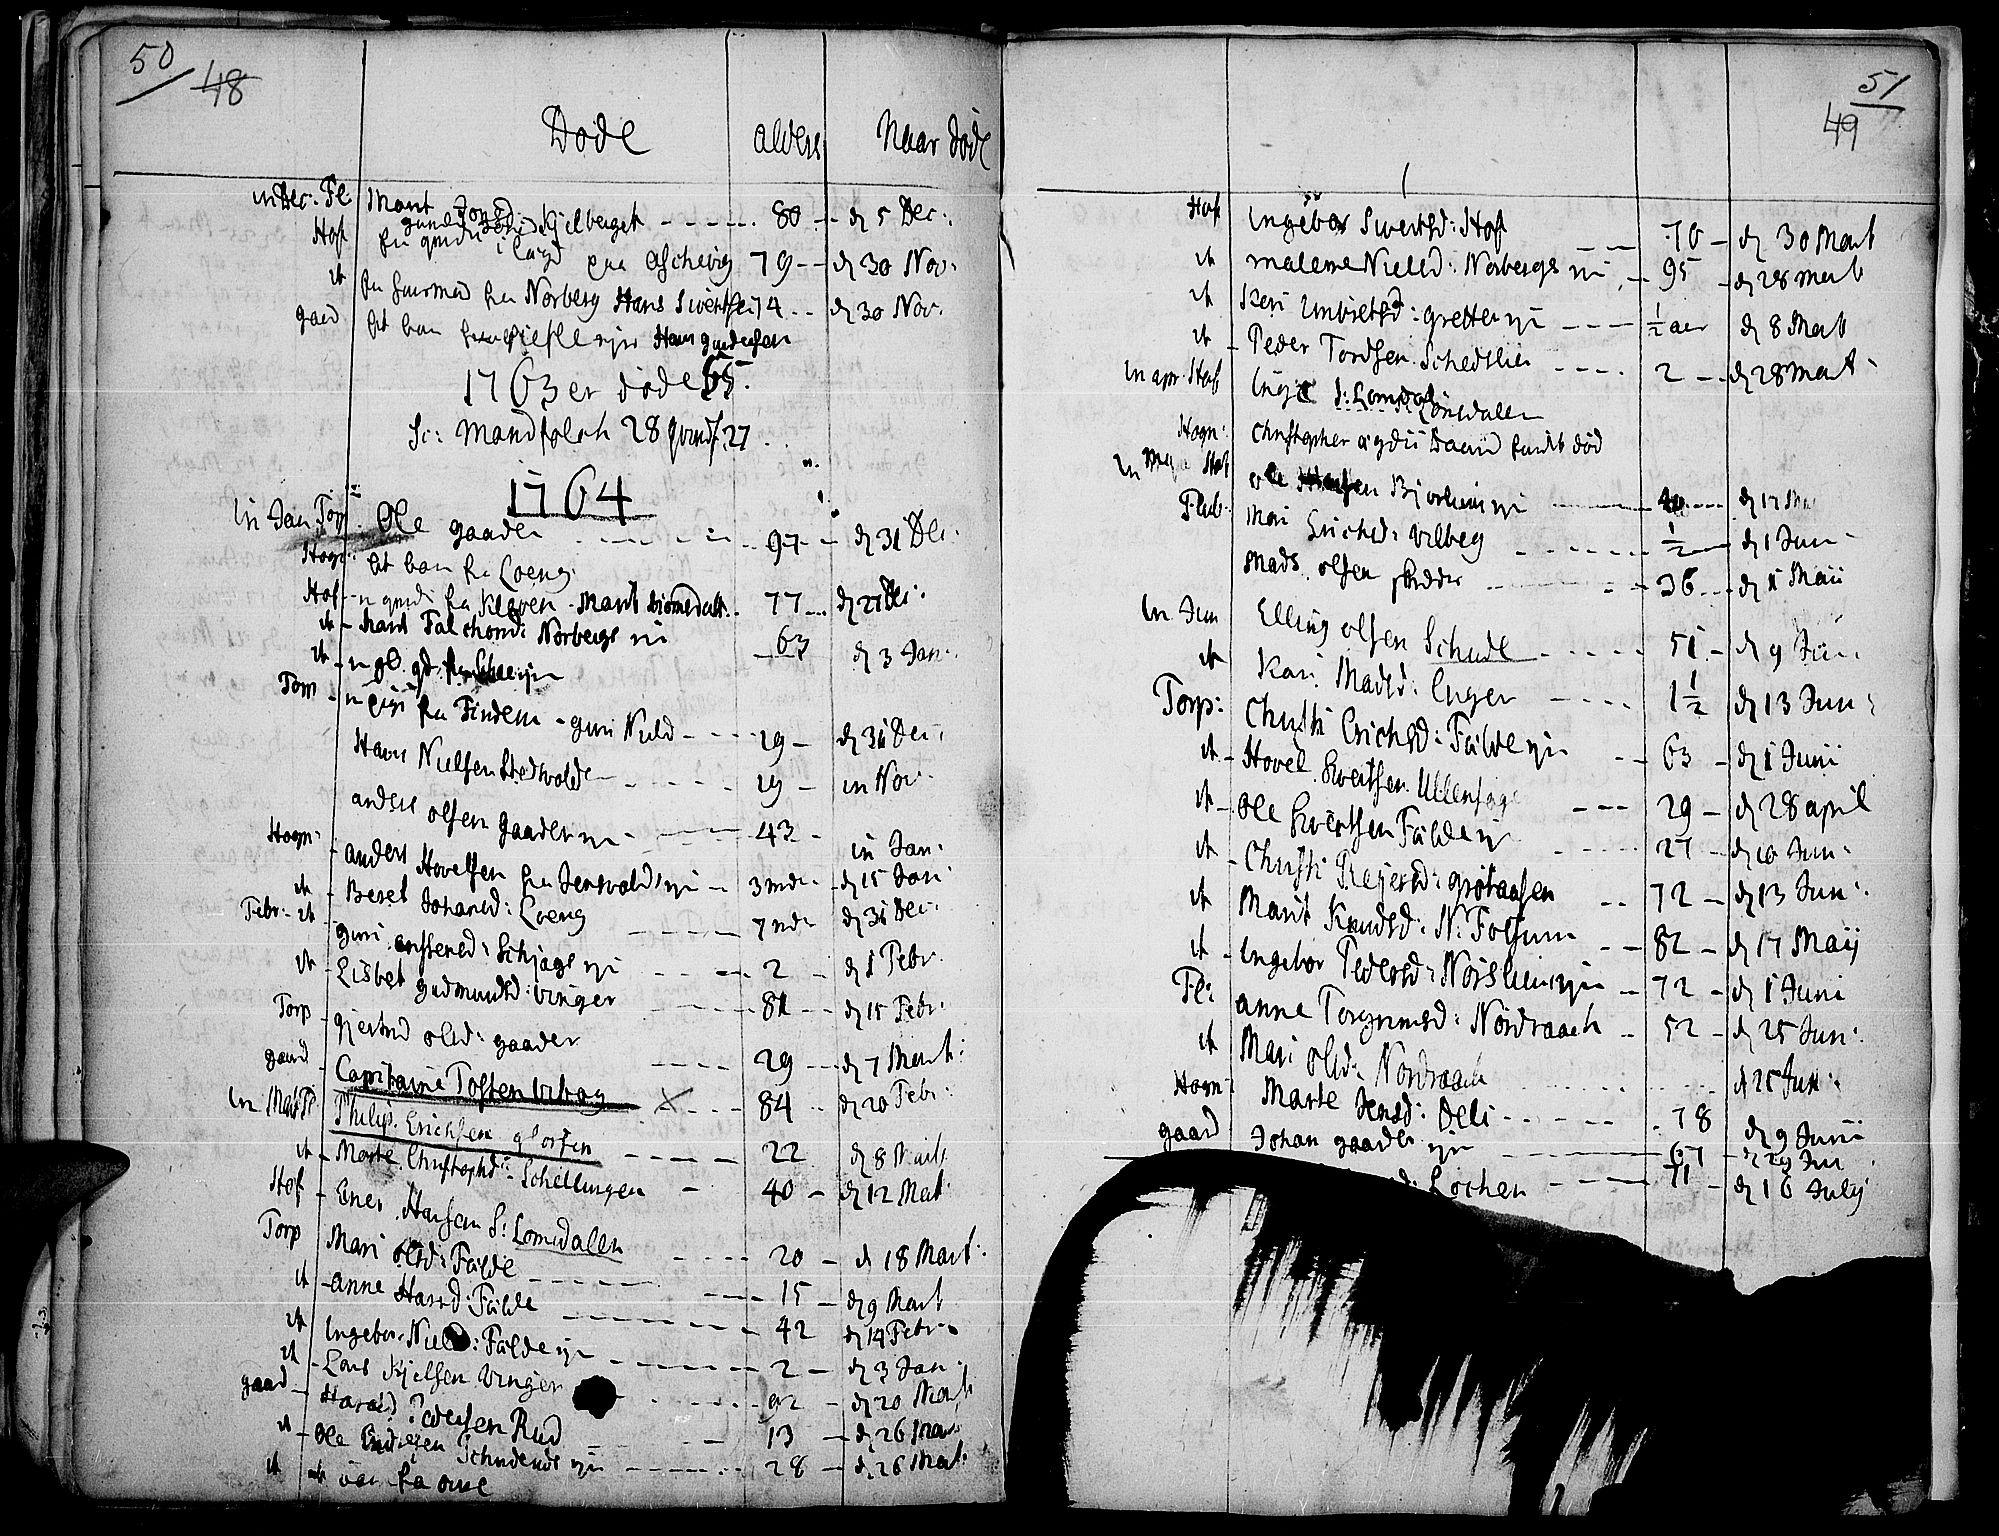 SAH, Land prestekontor, Ministerialbok nr. 4, 1733-1764, s. 50-51